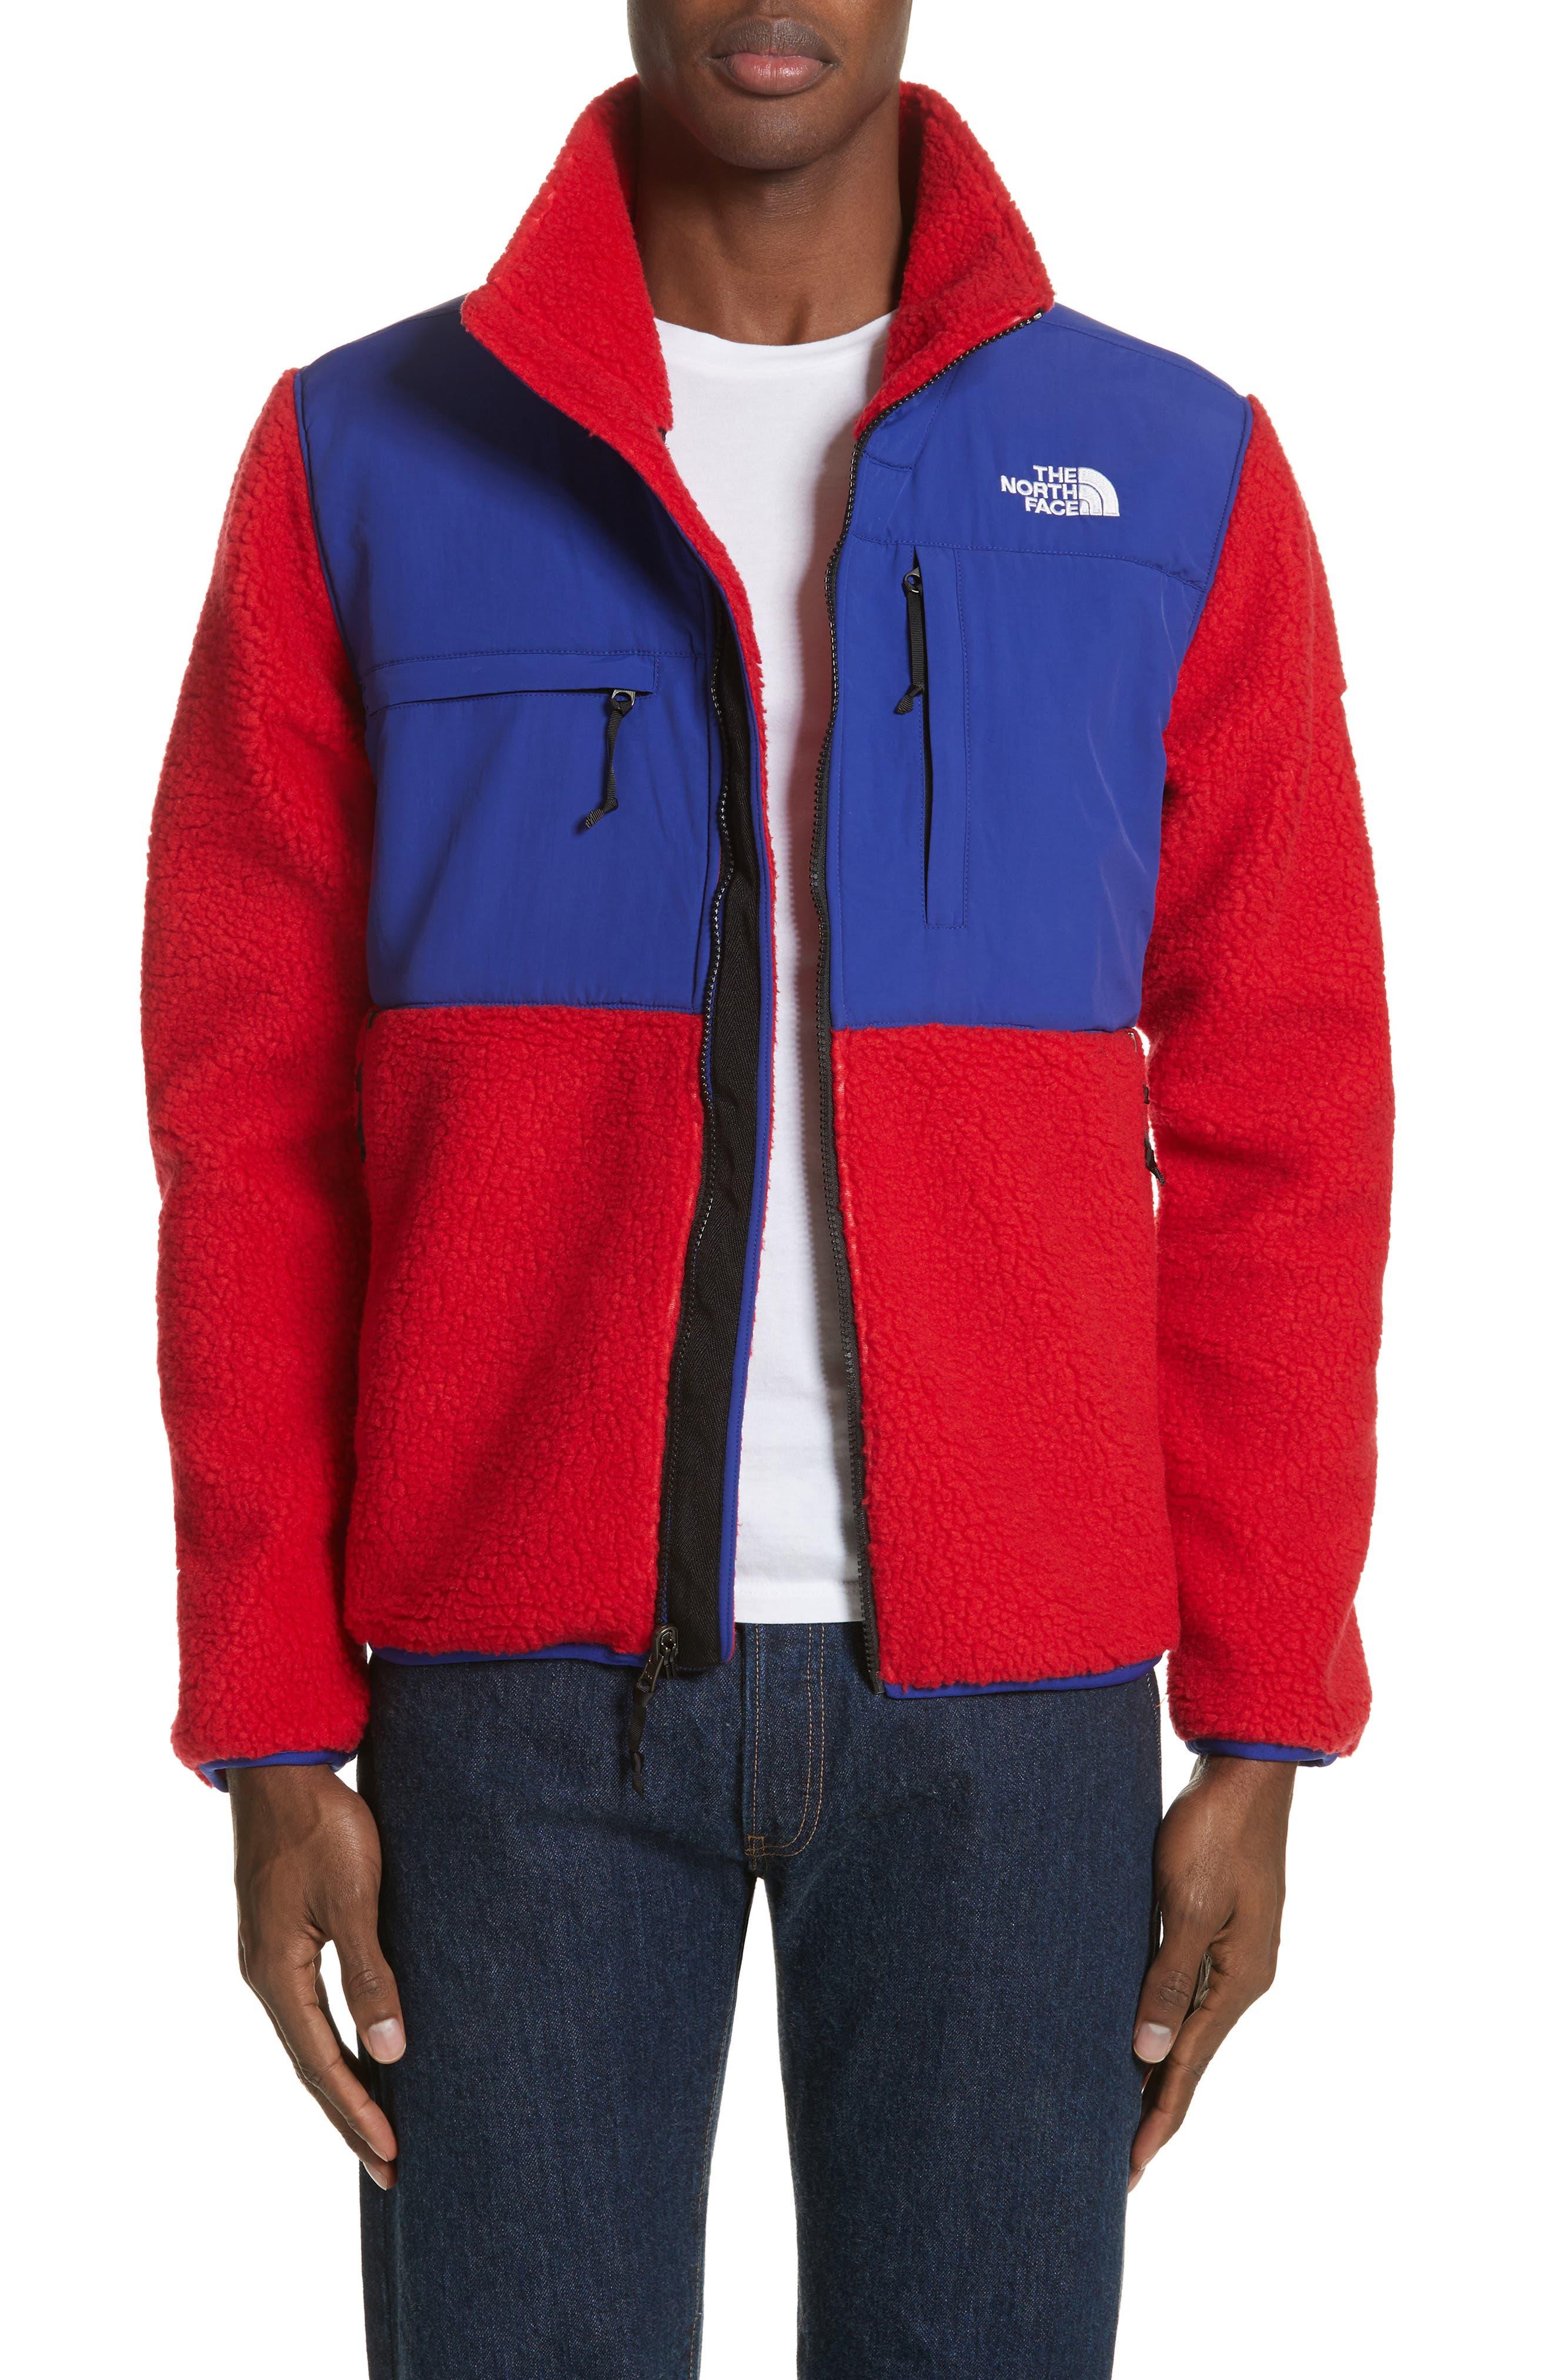 Denali Jacket,                             Alternate thumbnail 7, color,                             Tnf Red